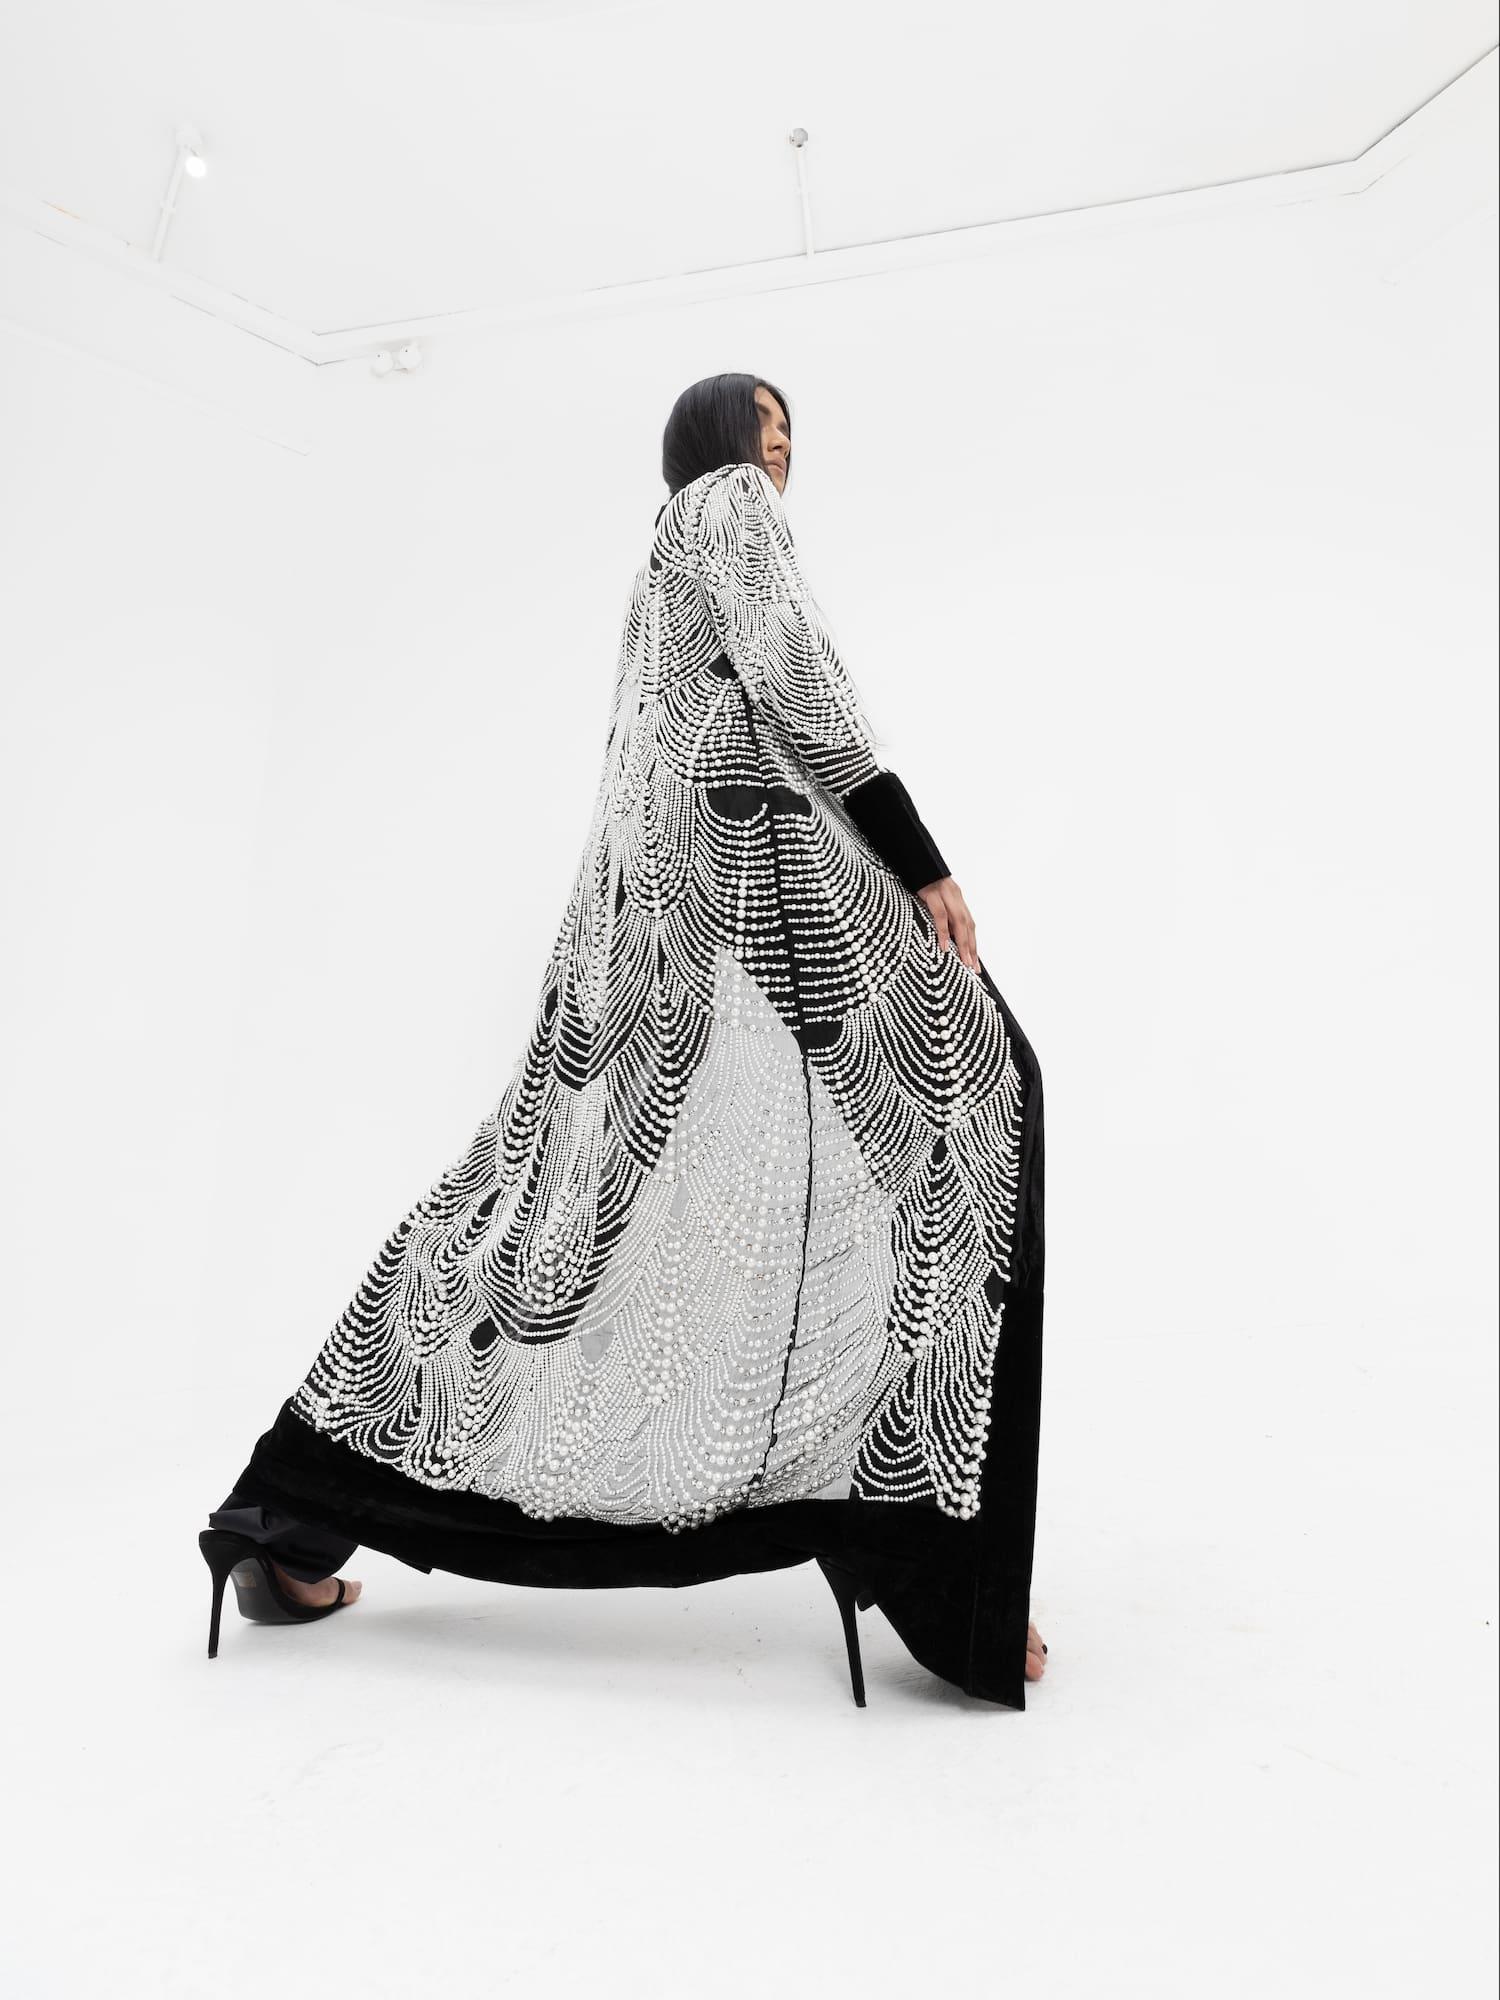 View 4 of model wearing Khhatak Kimono top in black.